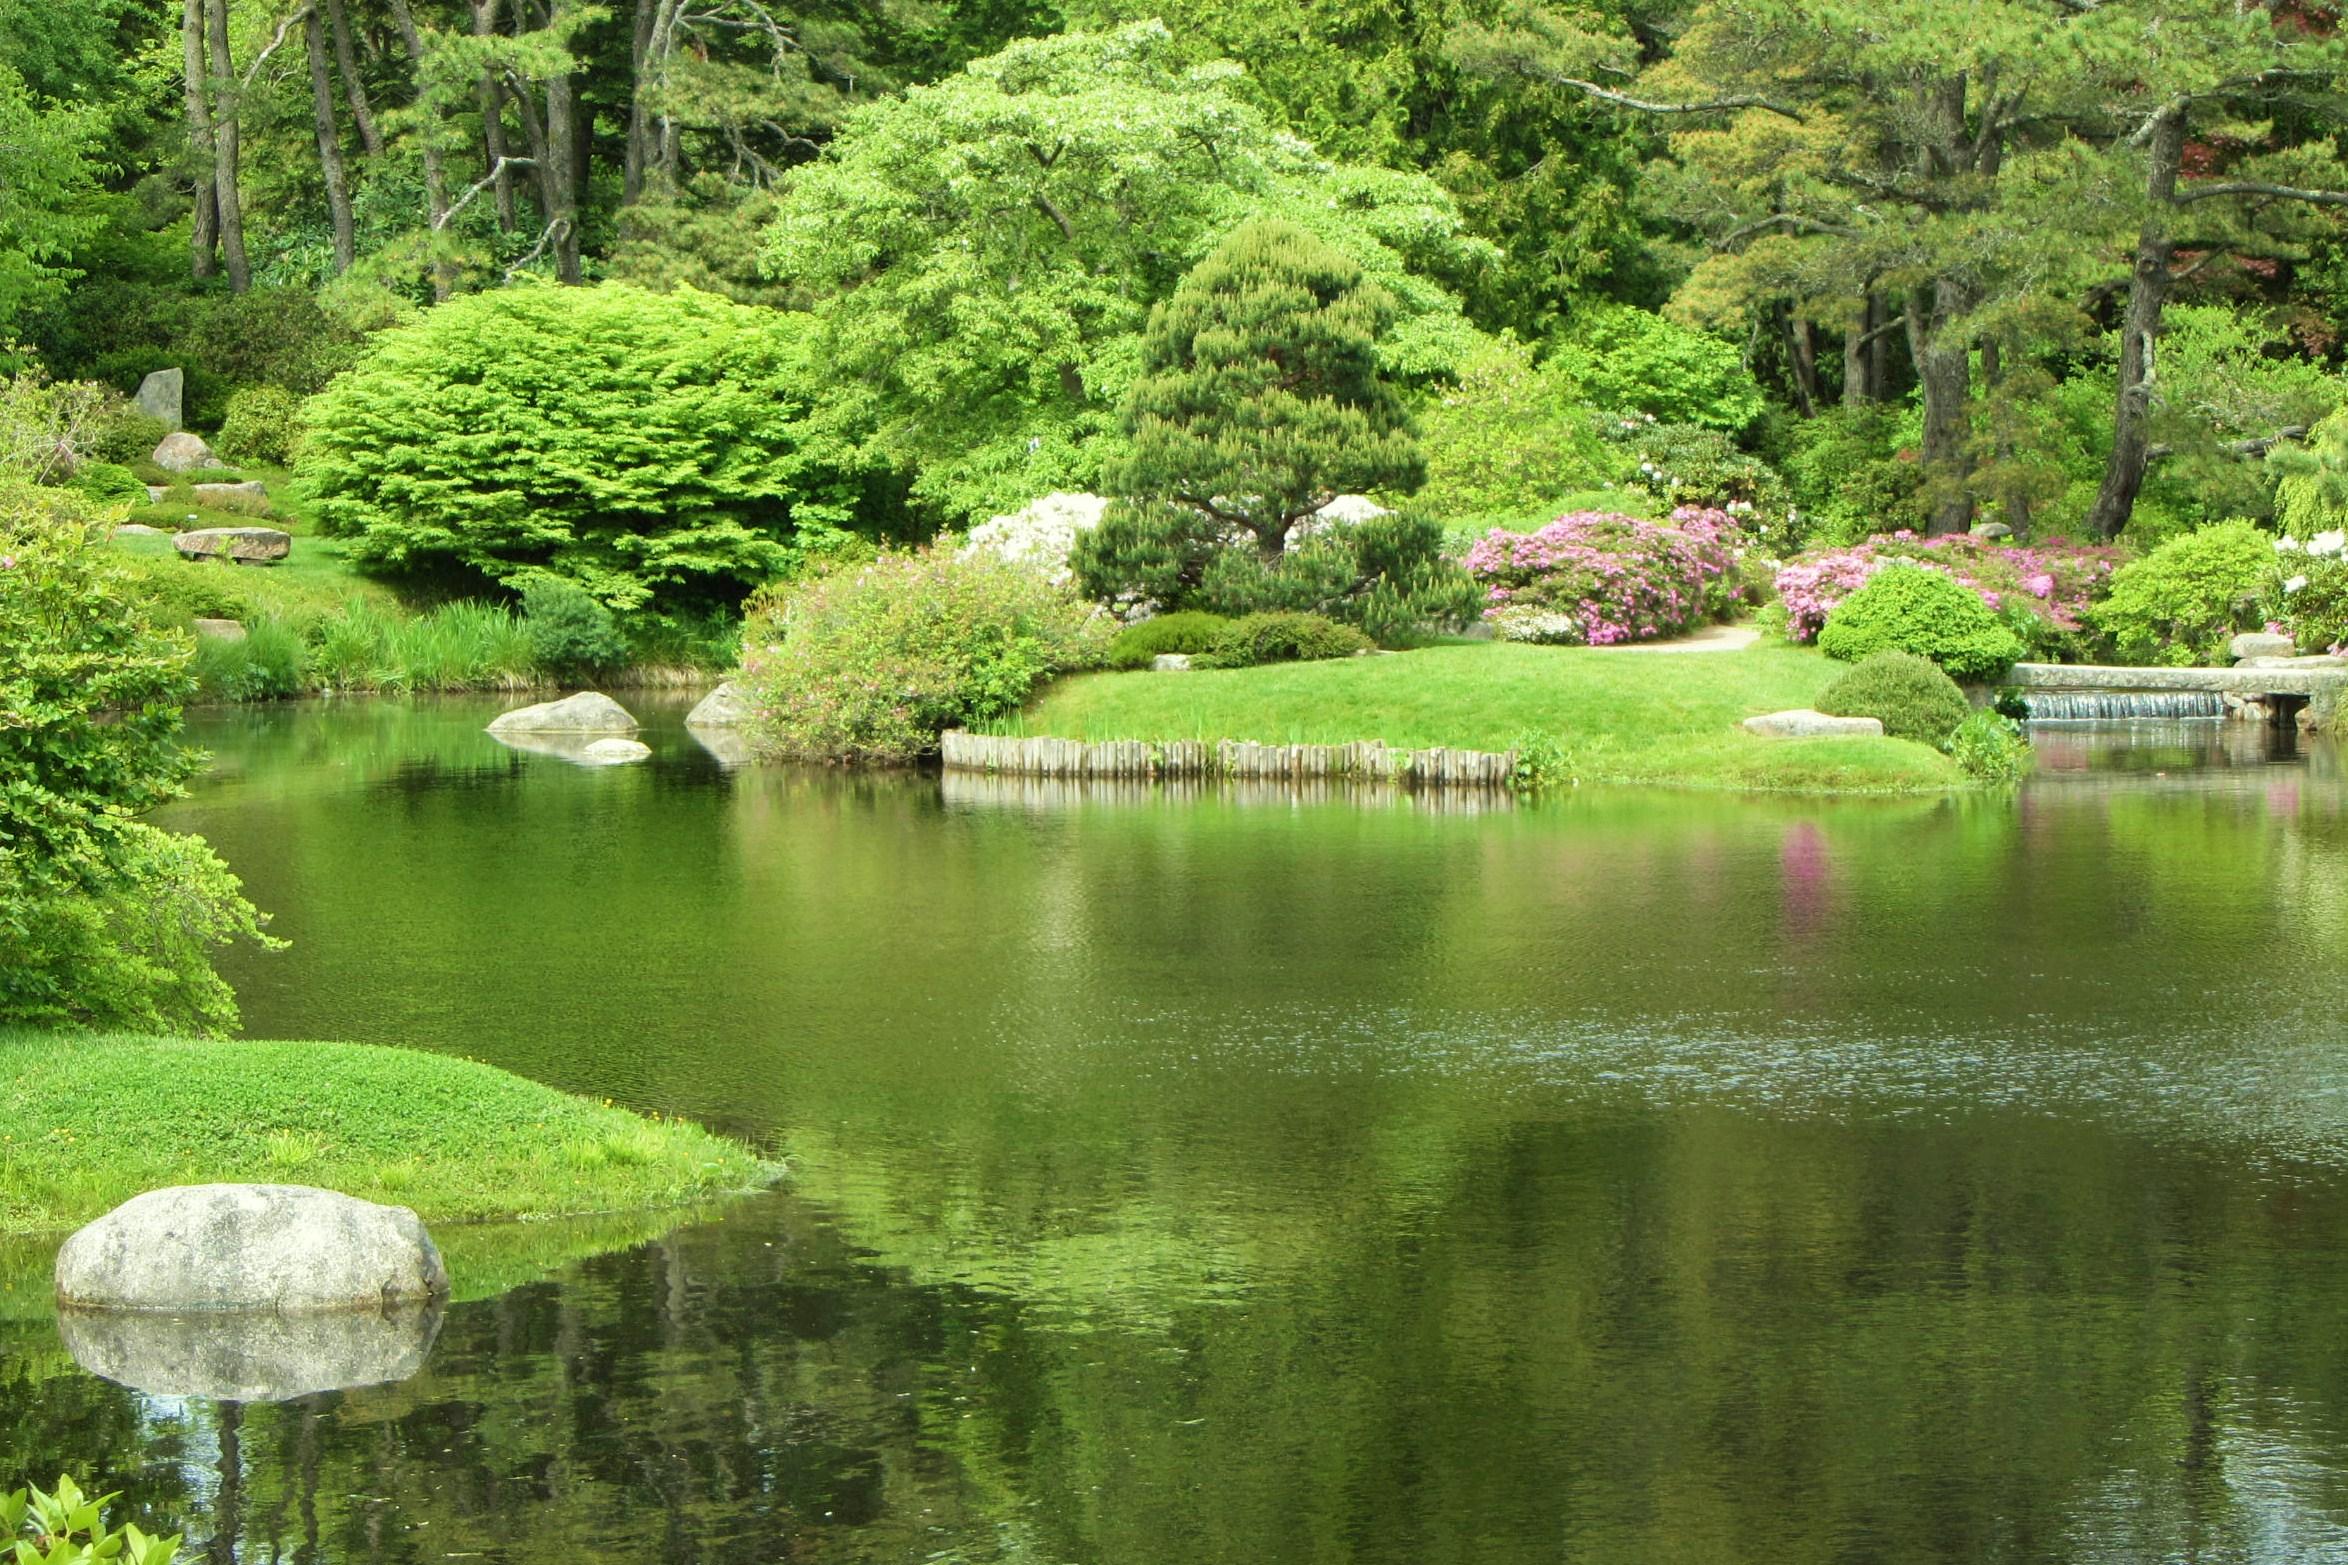 Trees, grass, water, rocks; all ordinary, extraordinarily beautiful. A garden in Bar Harbor, Maine, June 2012